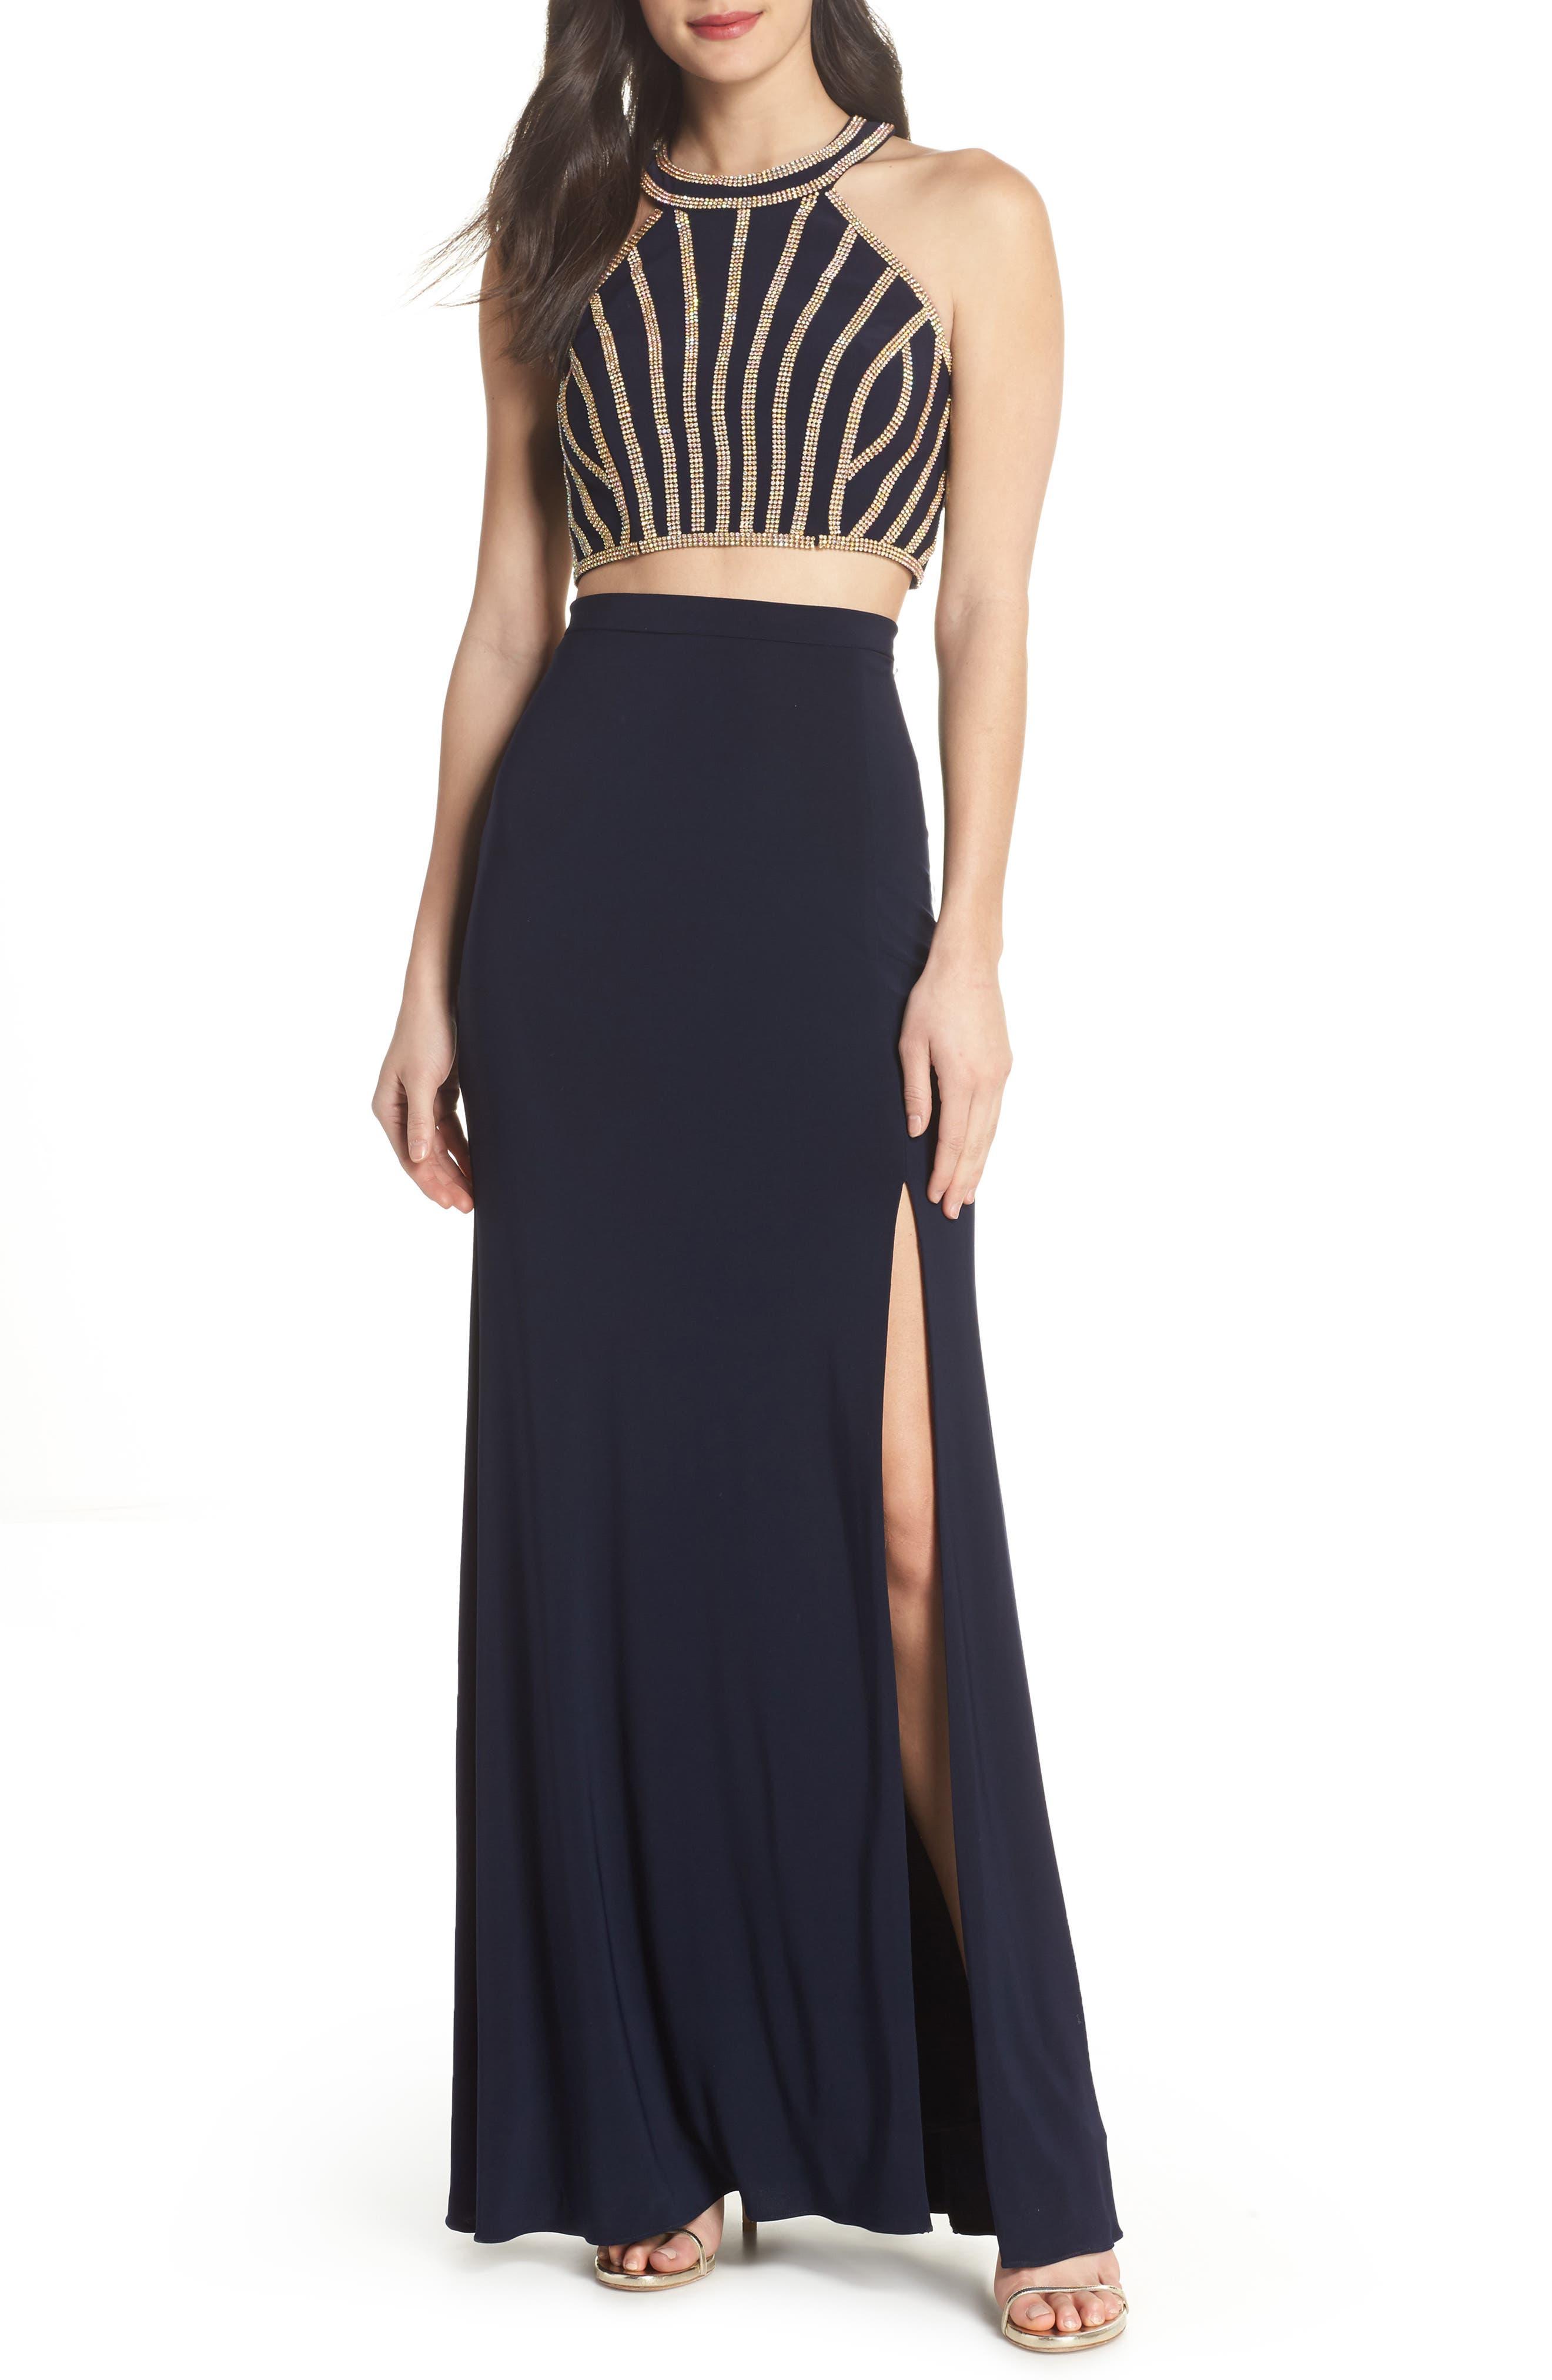 Xscape Beaded Top Two-Piece Dress